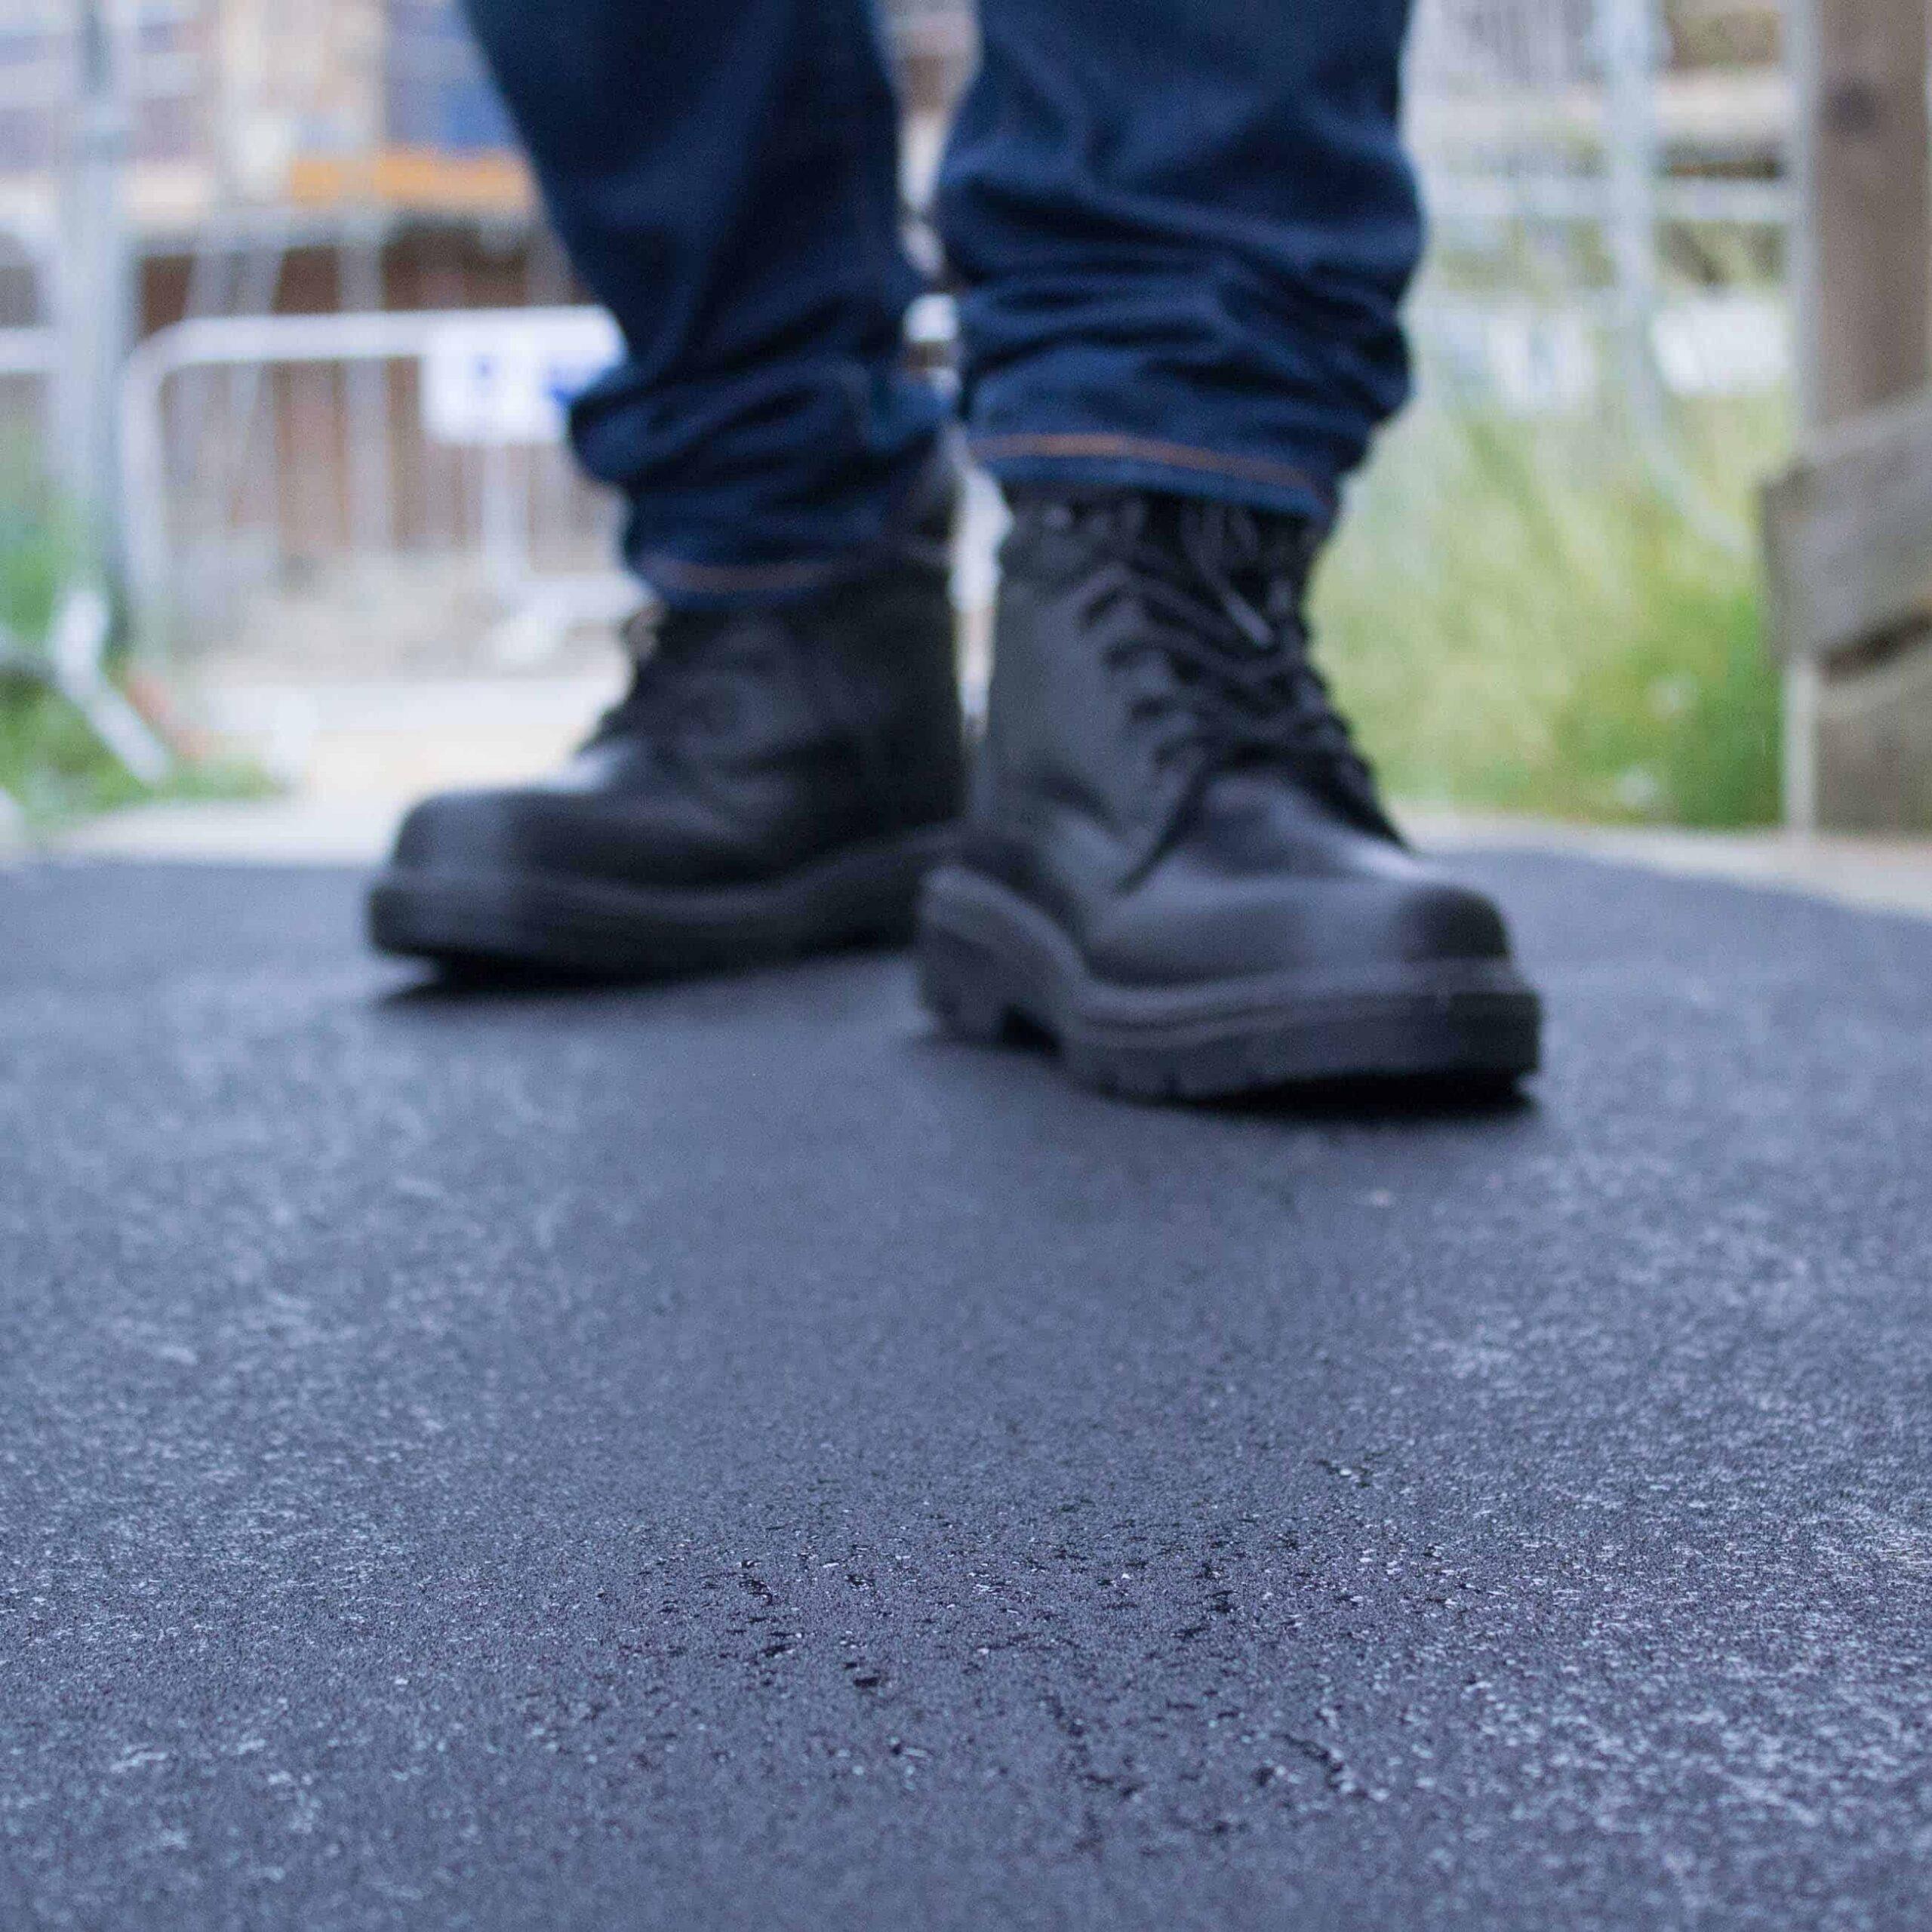 GripGuard Anti-Slip Grit Surface Matting